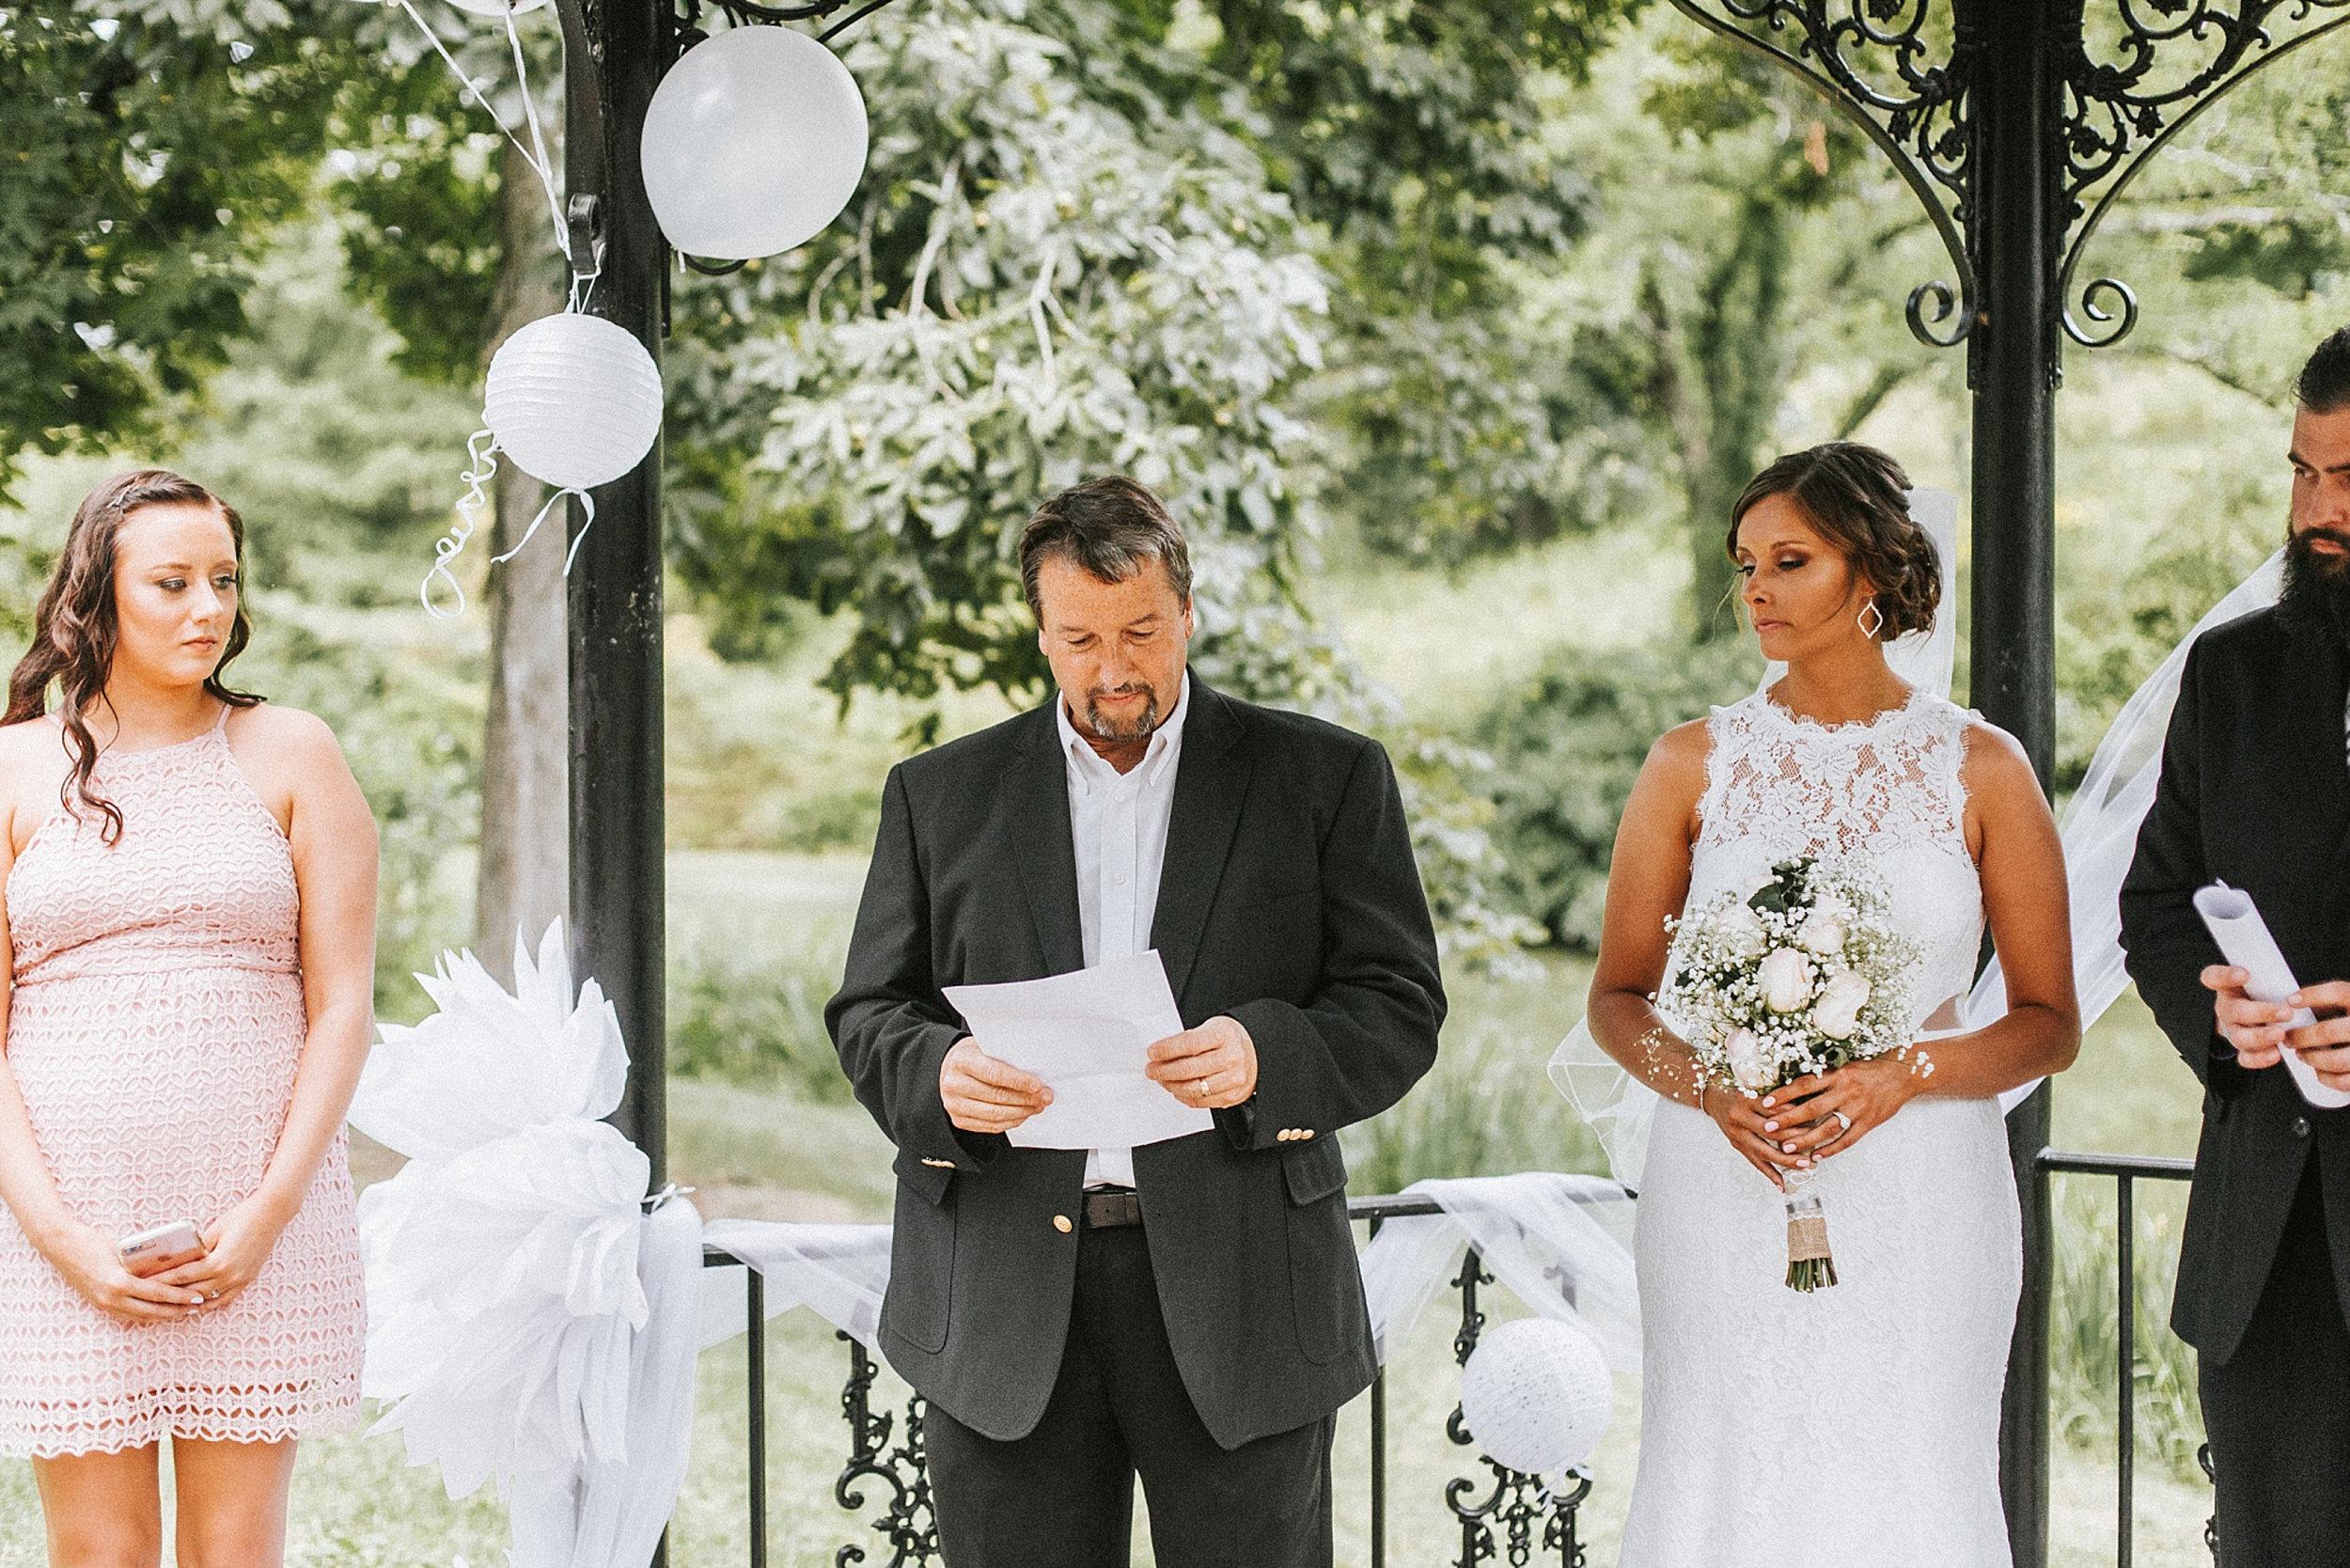 Brooke Townsend Photography - Ohio Wedding Photographer (56 of 78).jpg